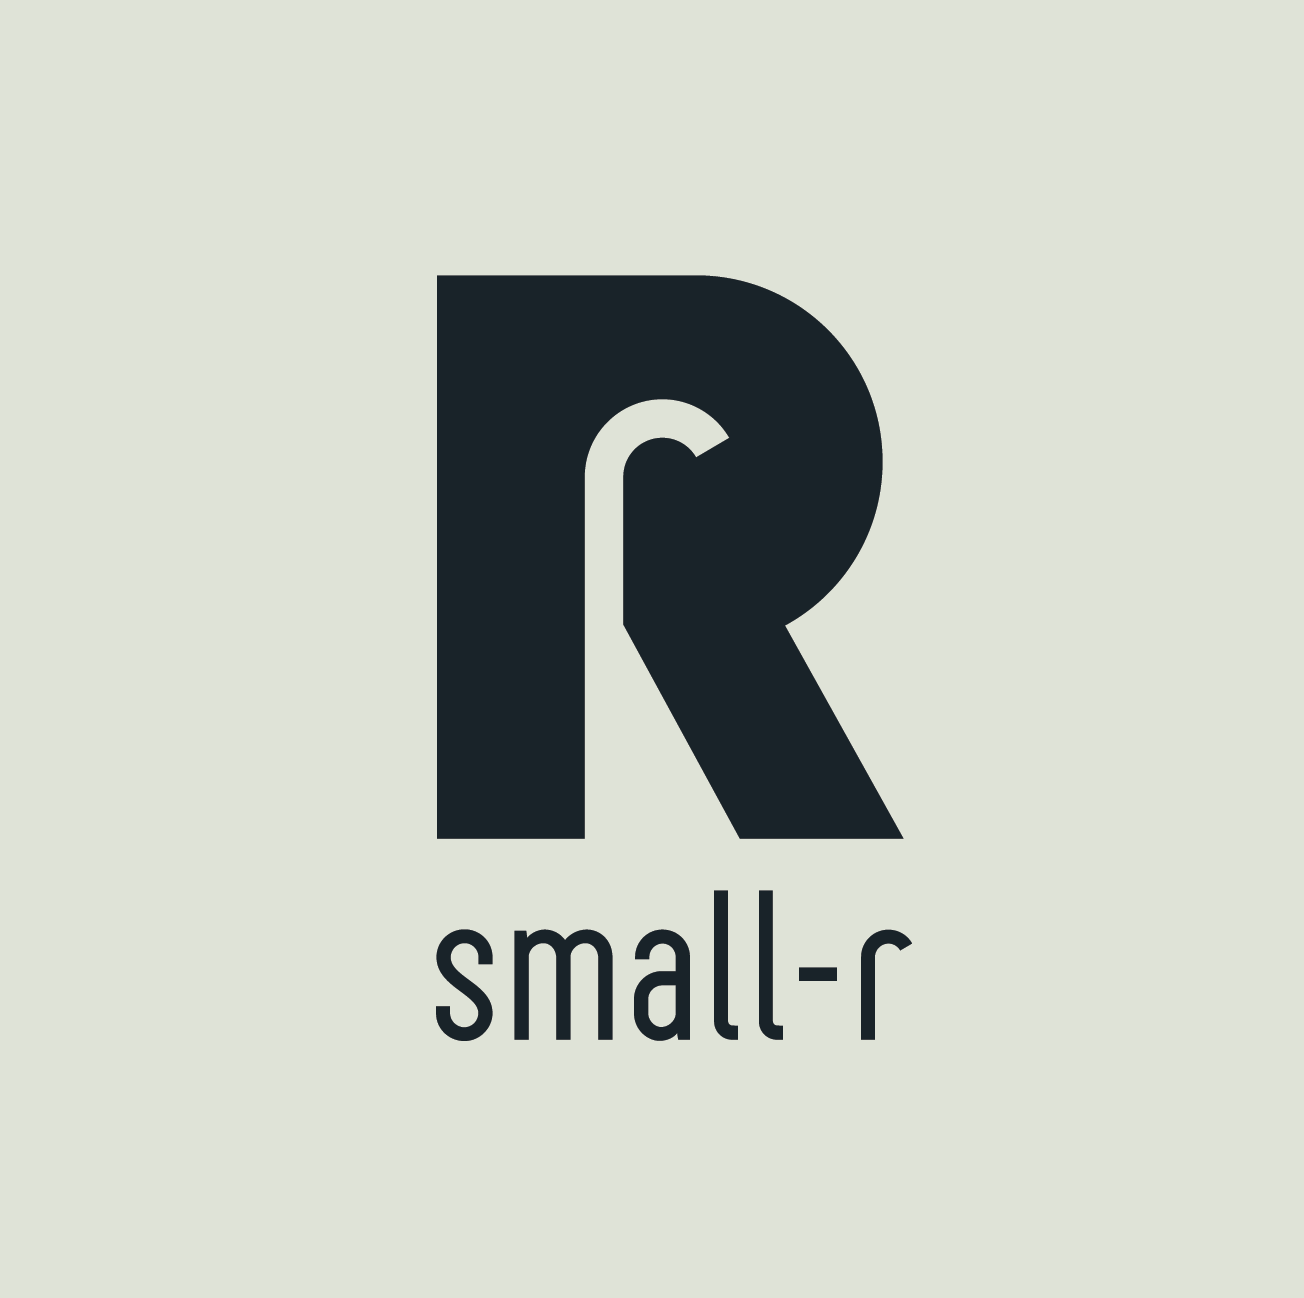 small-r logo